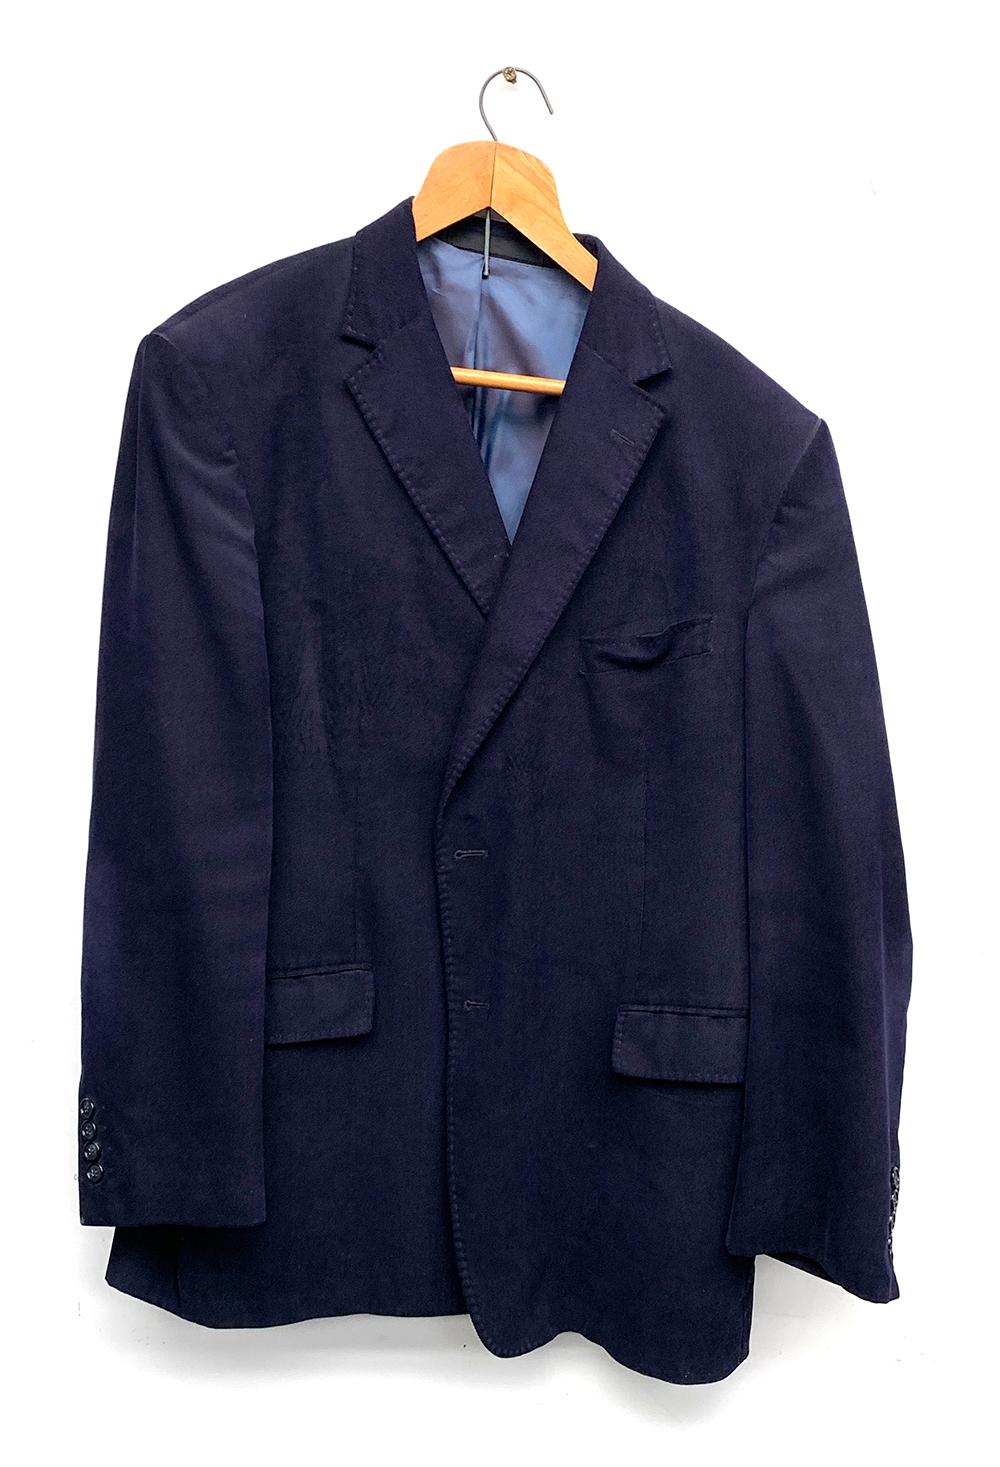 "A needlepoint navy cord jacket, chest 44"""